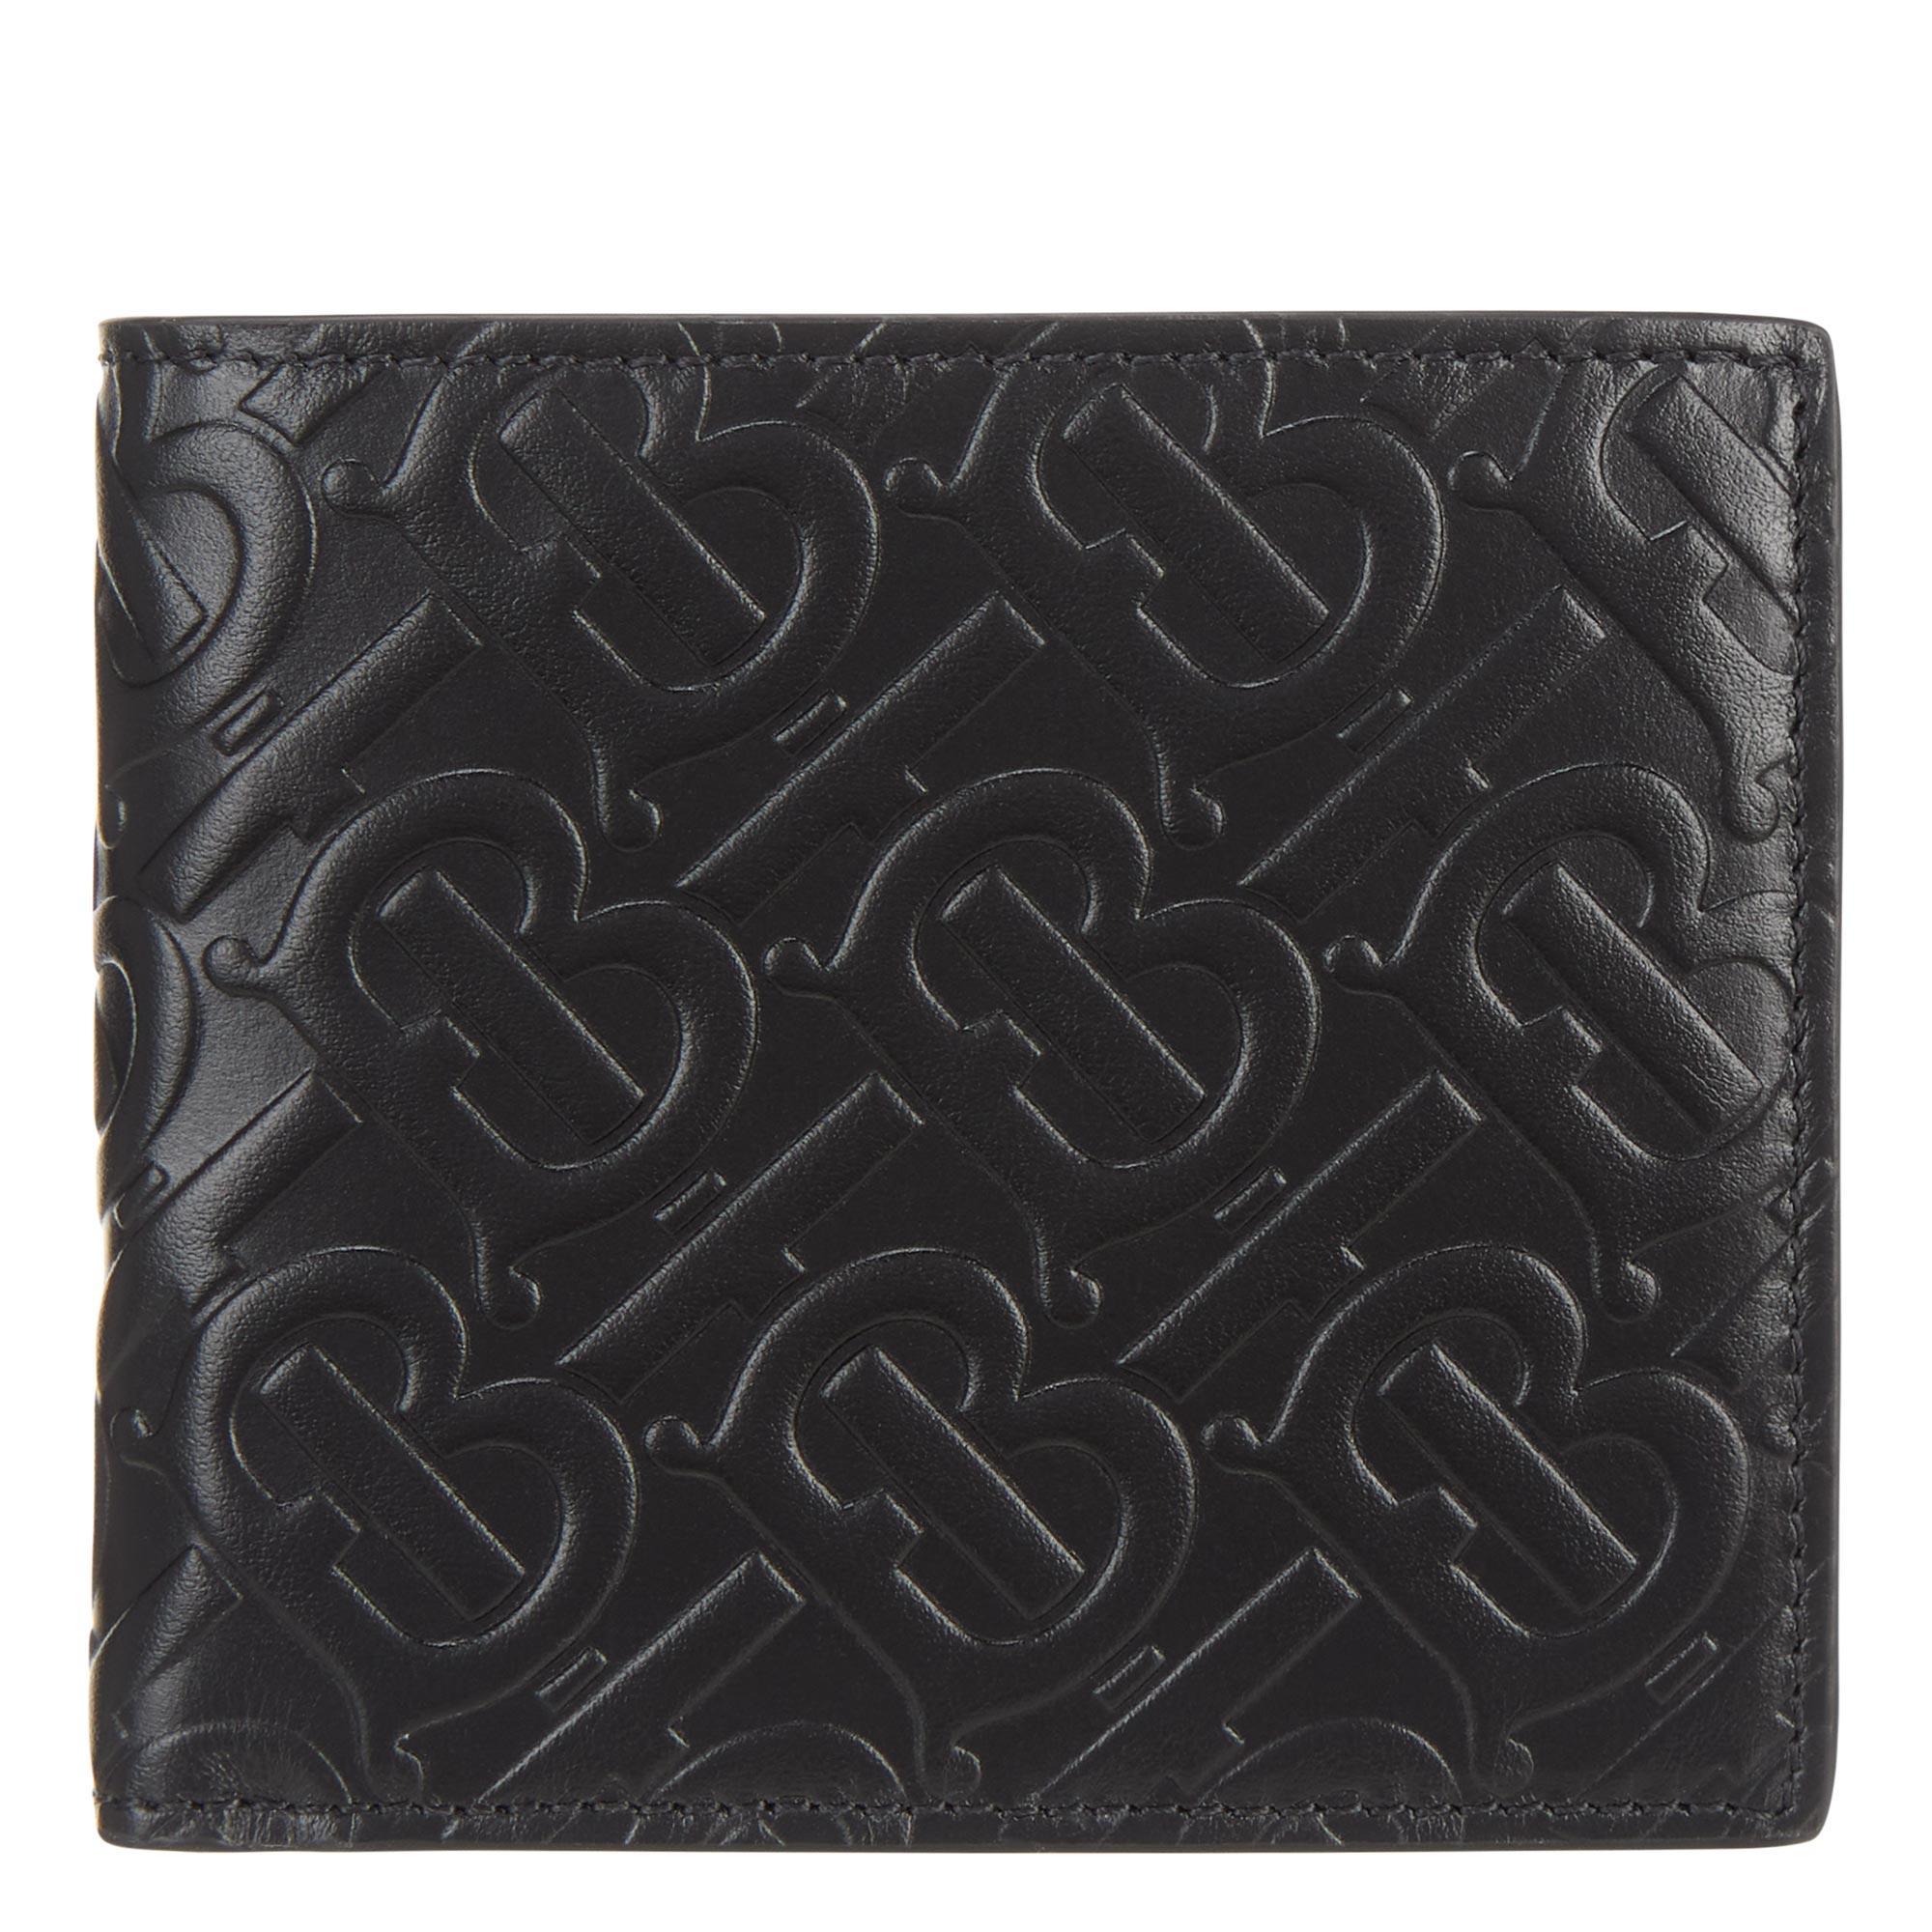 TB Monogram Leather Wallet